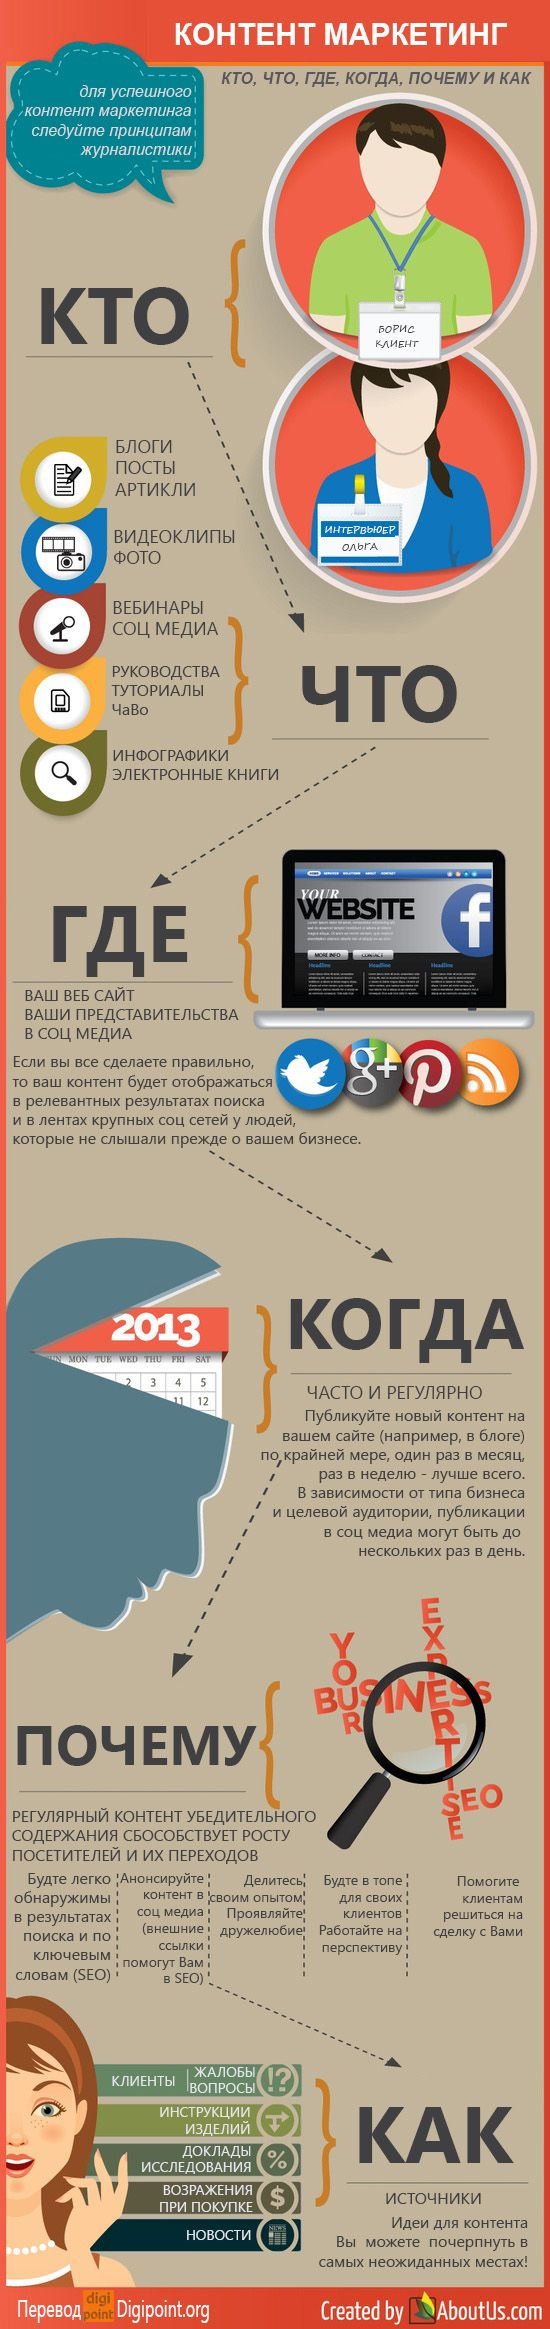 Контент Маркетинг  #маркетинг #продвижение #раскрутка #бизнес #контент #инфографика